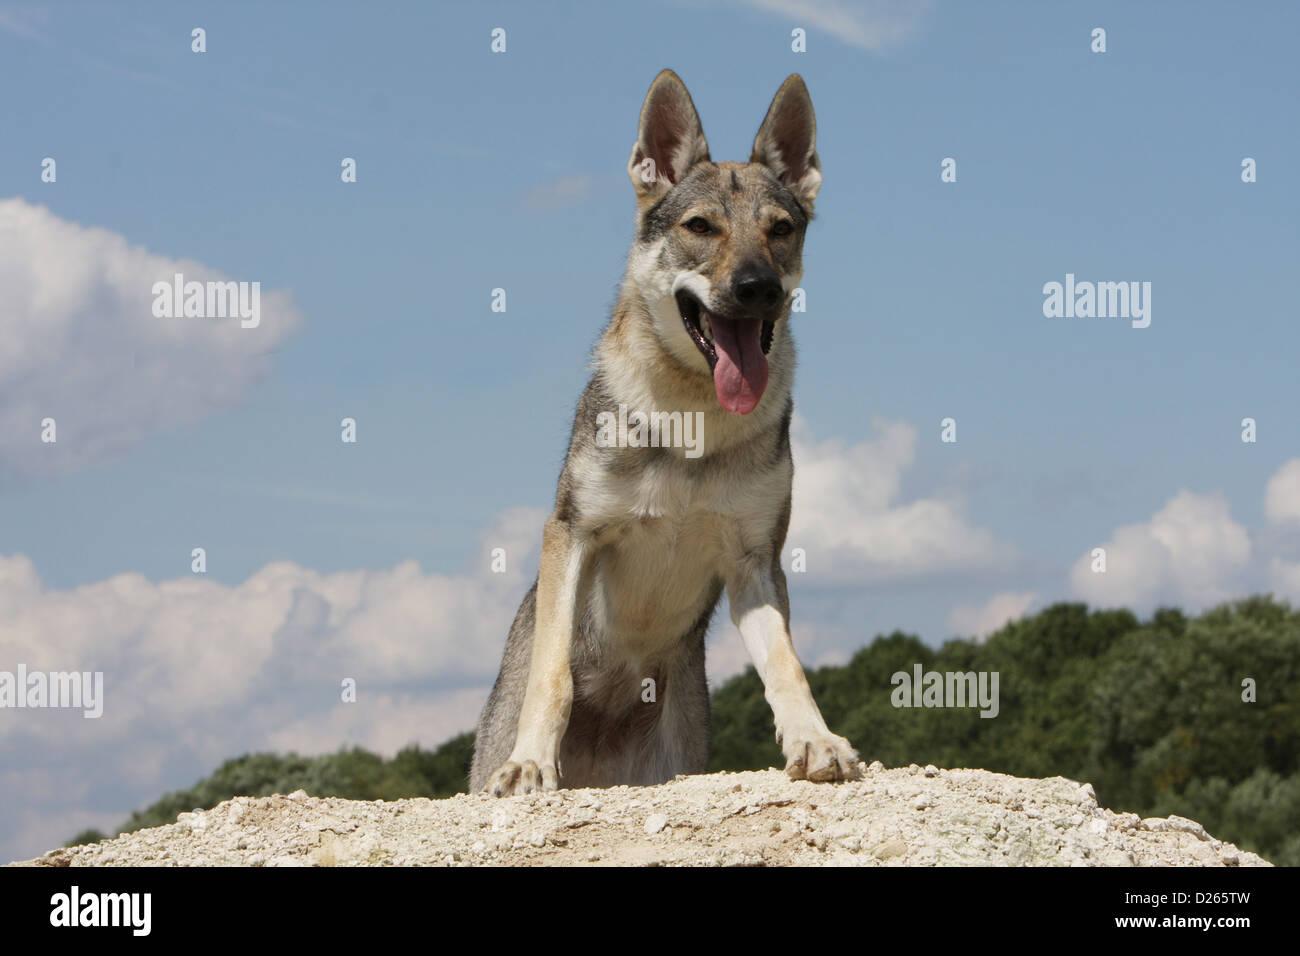 Dog Czechoslovakian wolfdog / Tschechoslowakischer Wolfhund young standing - Stock Image